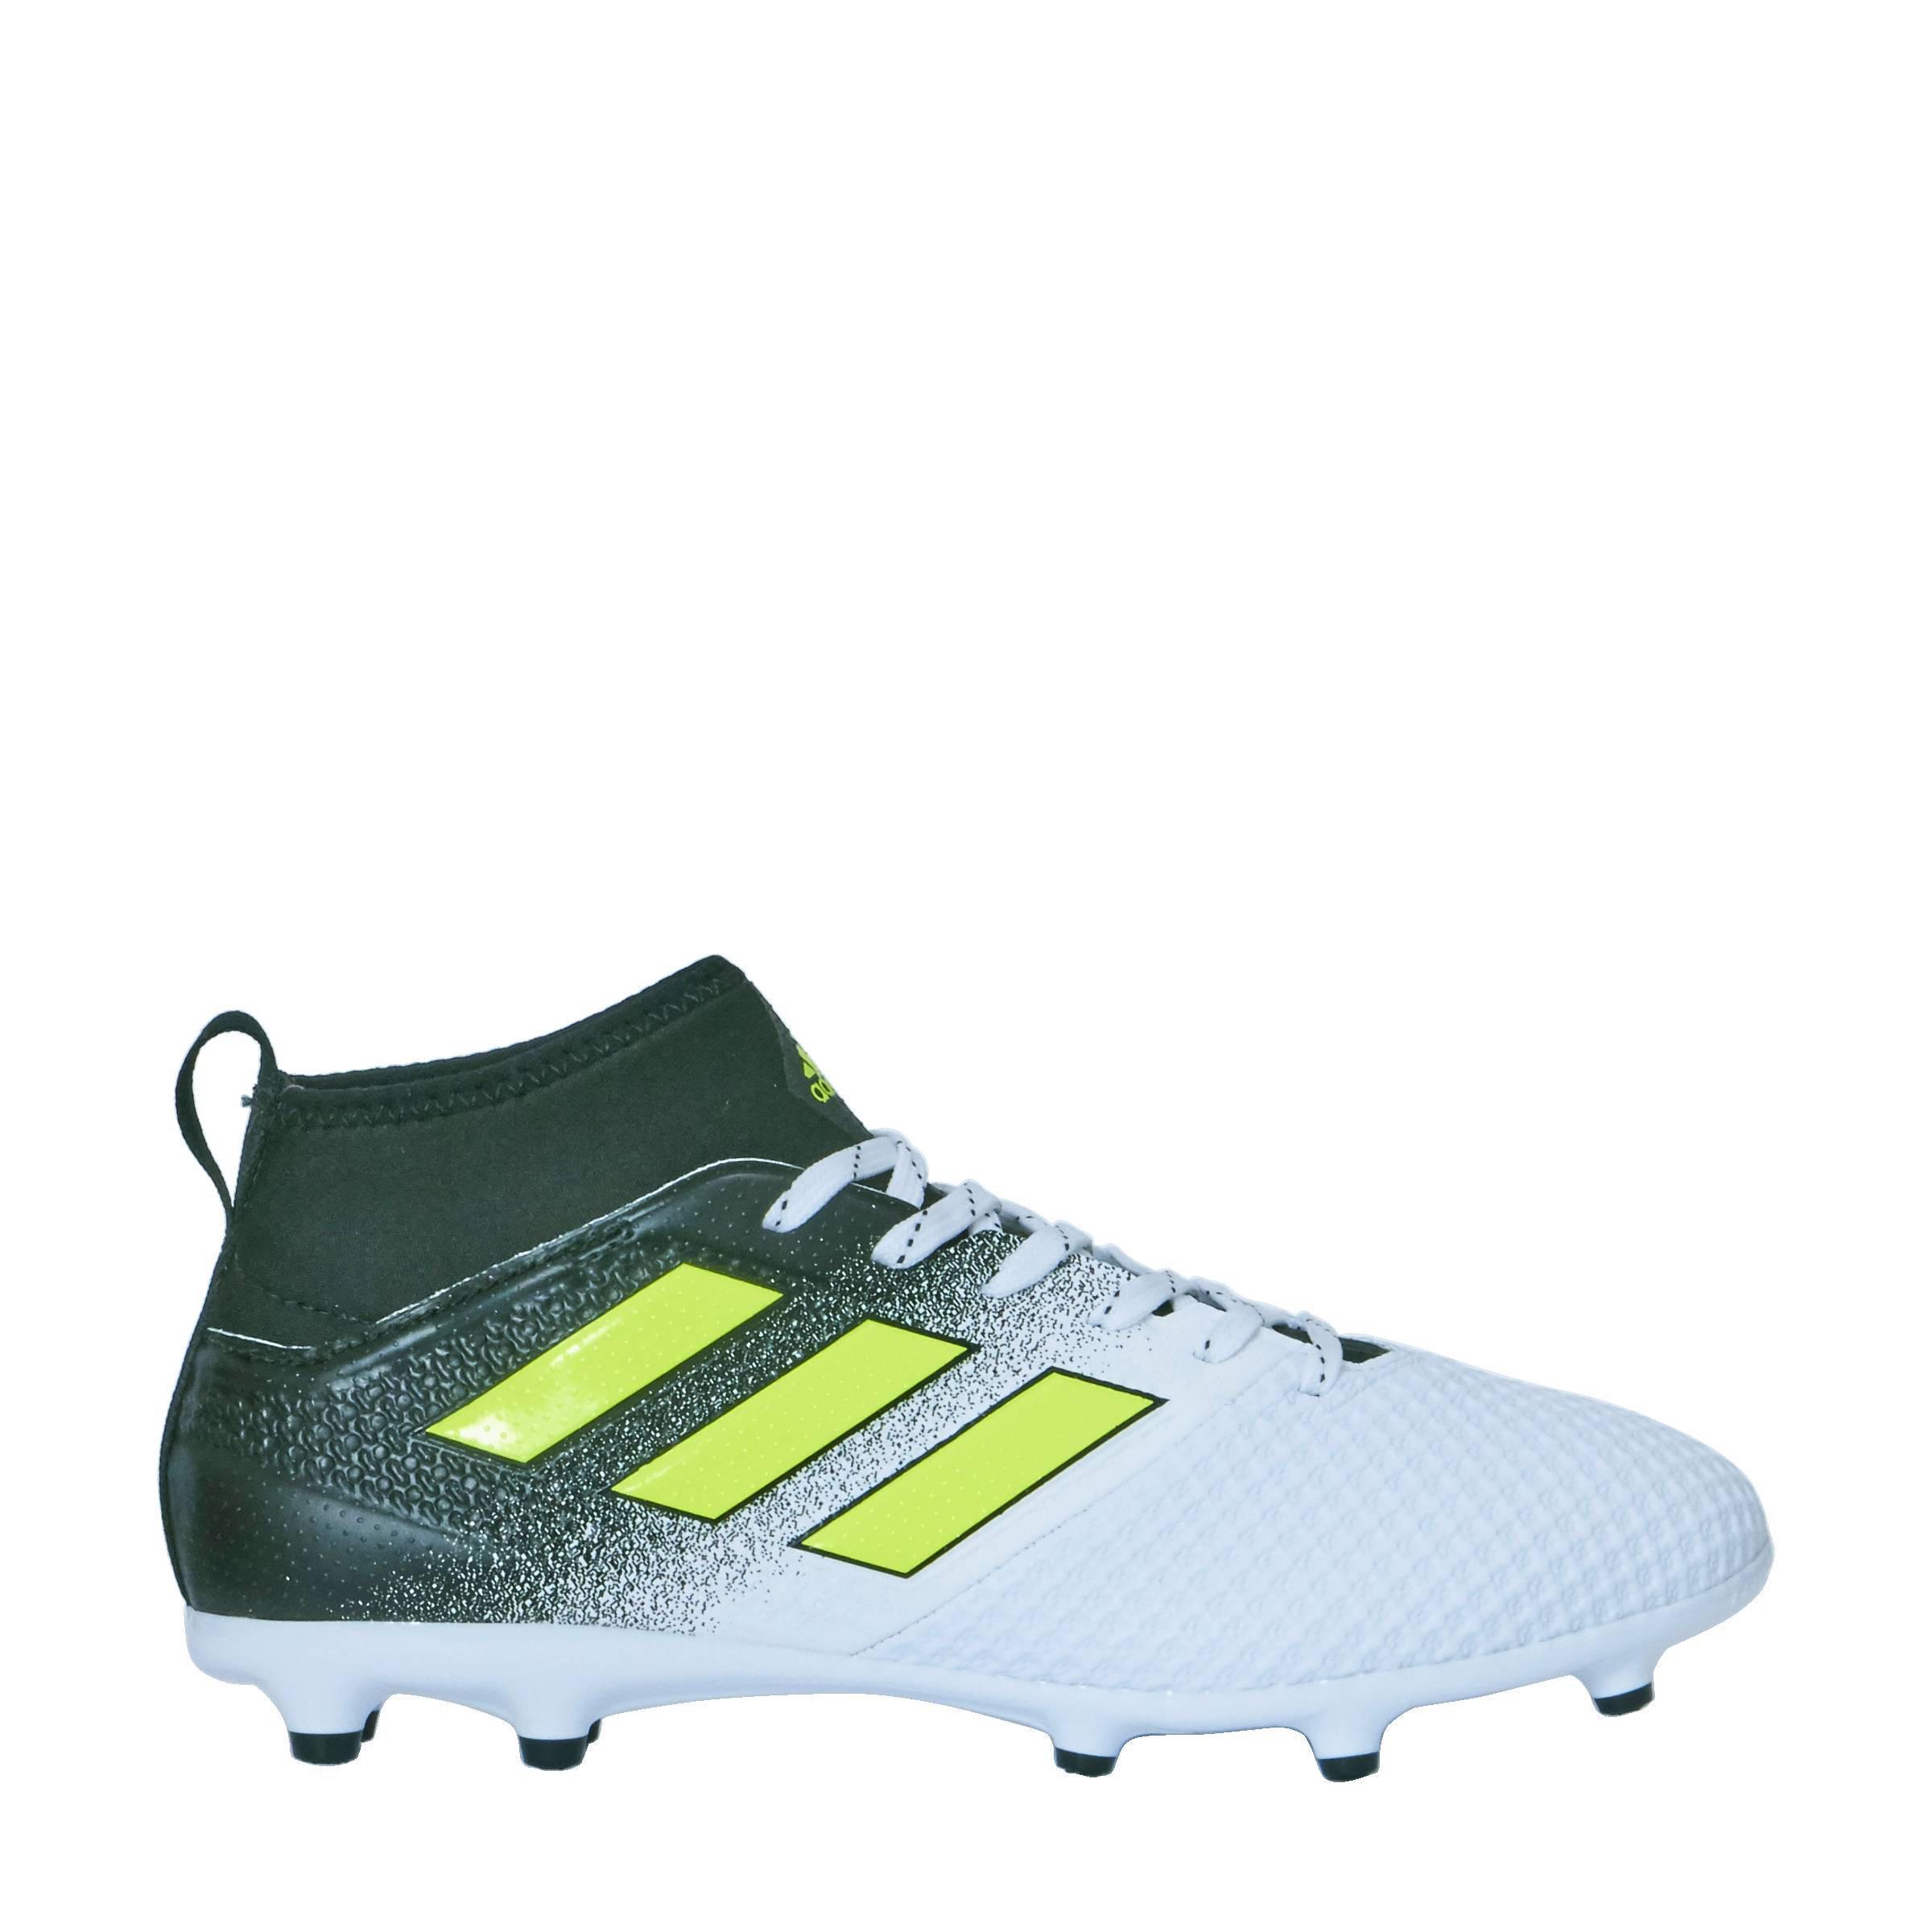 adidas Performance Ace 17.3 voetbalschoenen